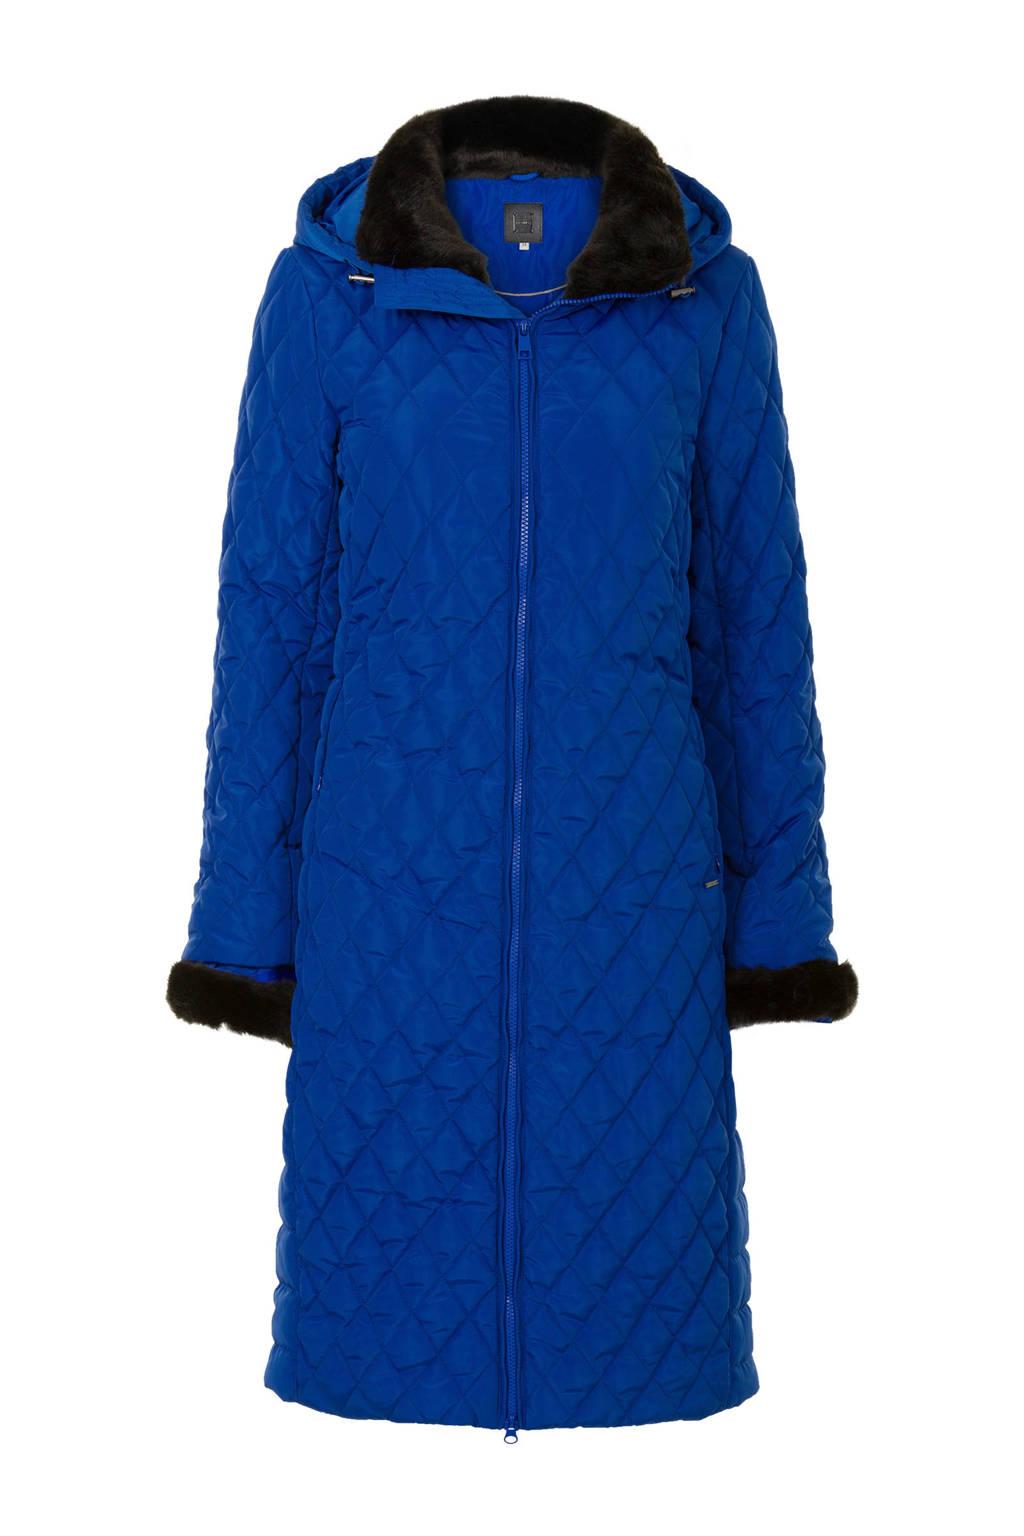 Lange Blauwe Winterjas.Promiss Lange Winterjas Blauw Waste2wear Wehkamp